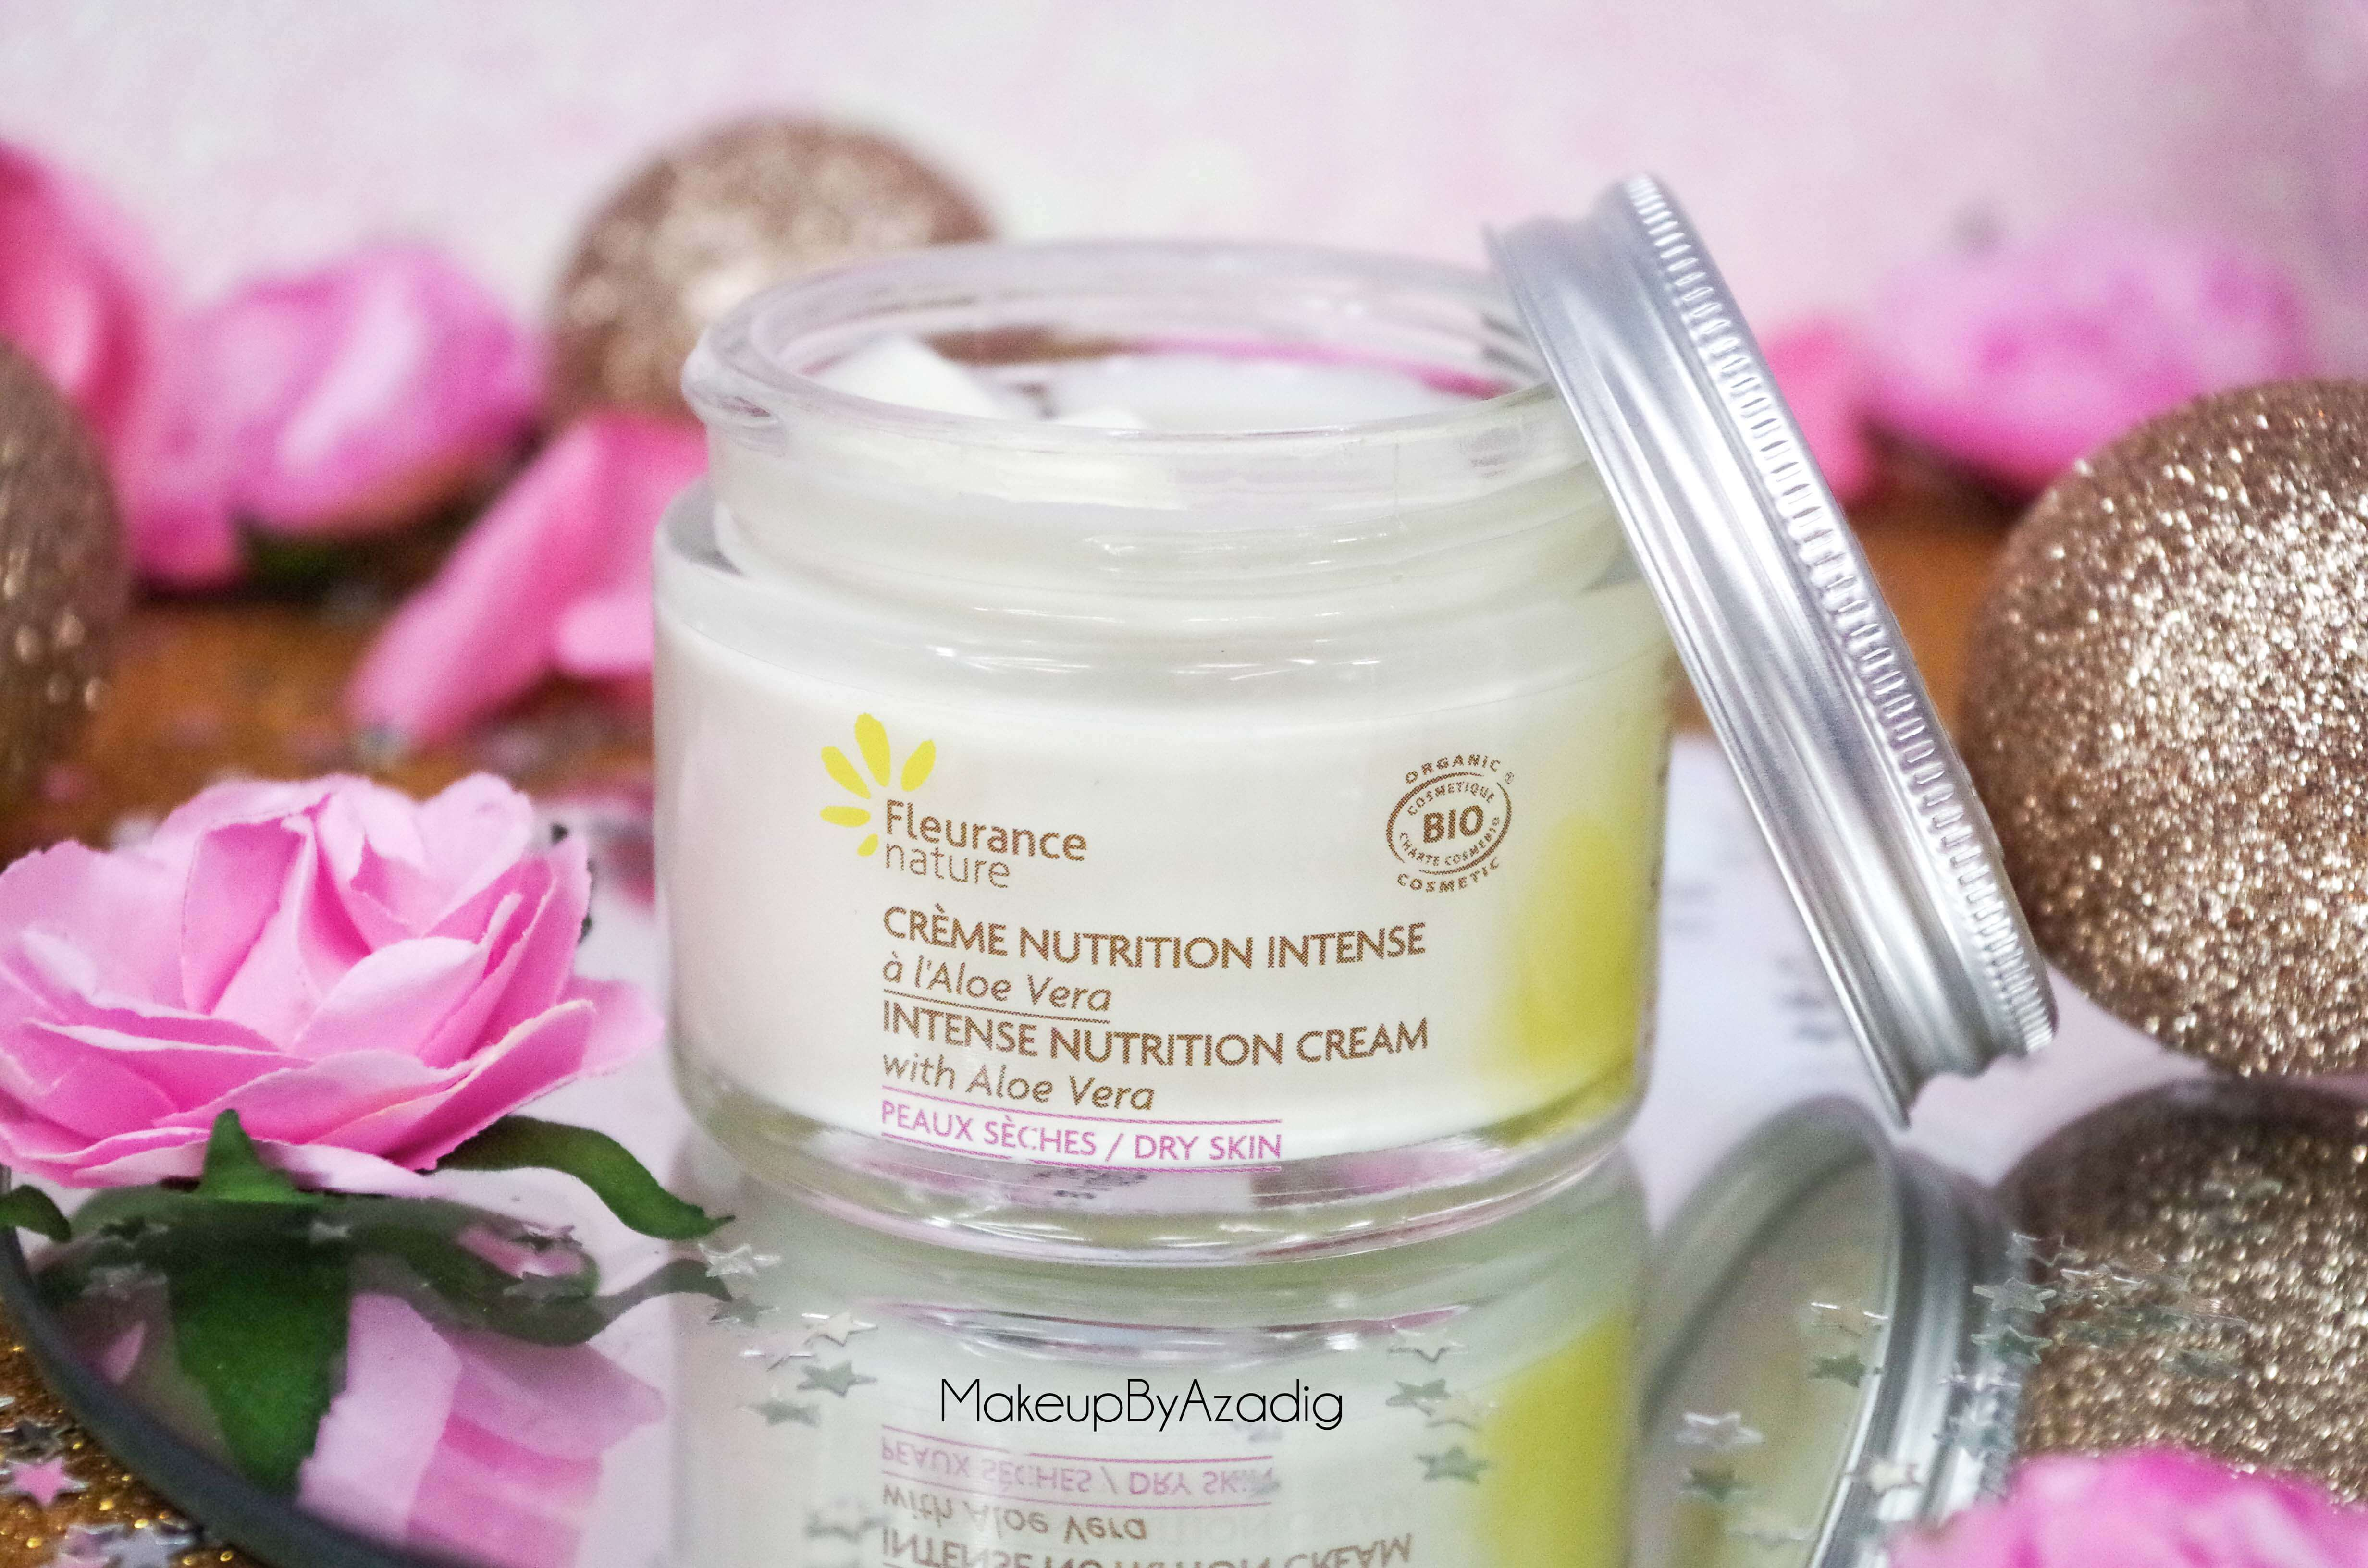 creme-nutrition-intense-serum-nuit-fleur-immortelle-fleurance-nature-makeupbyazadig-revue-prix-avis-cosmetique